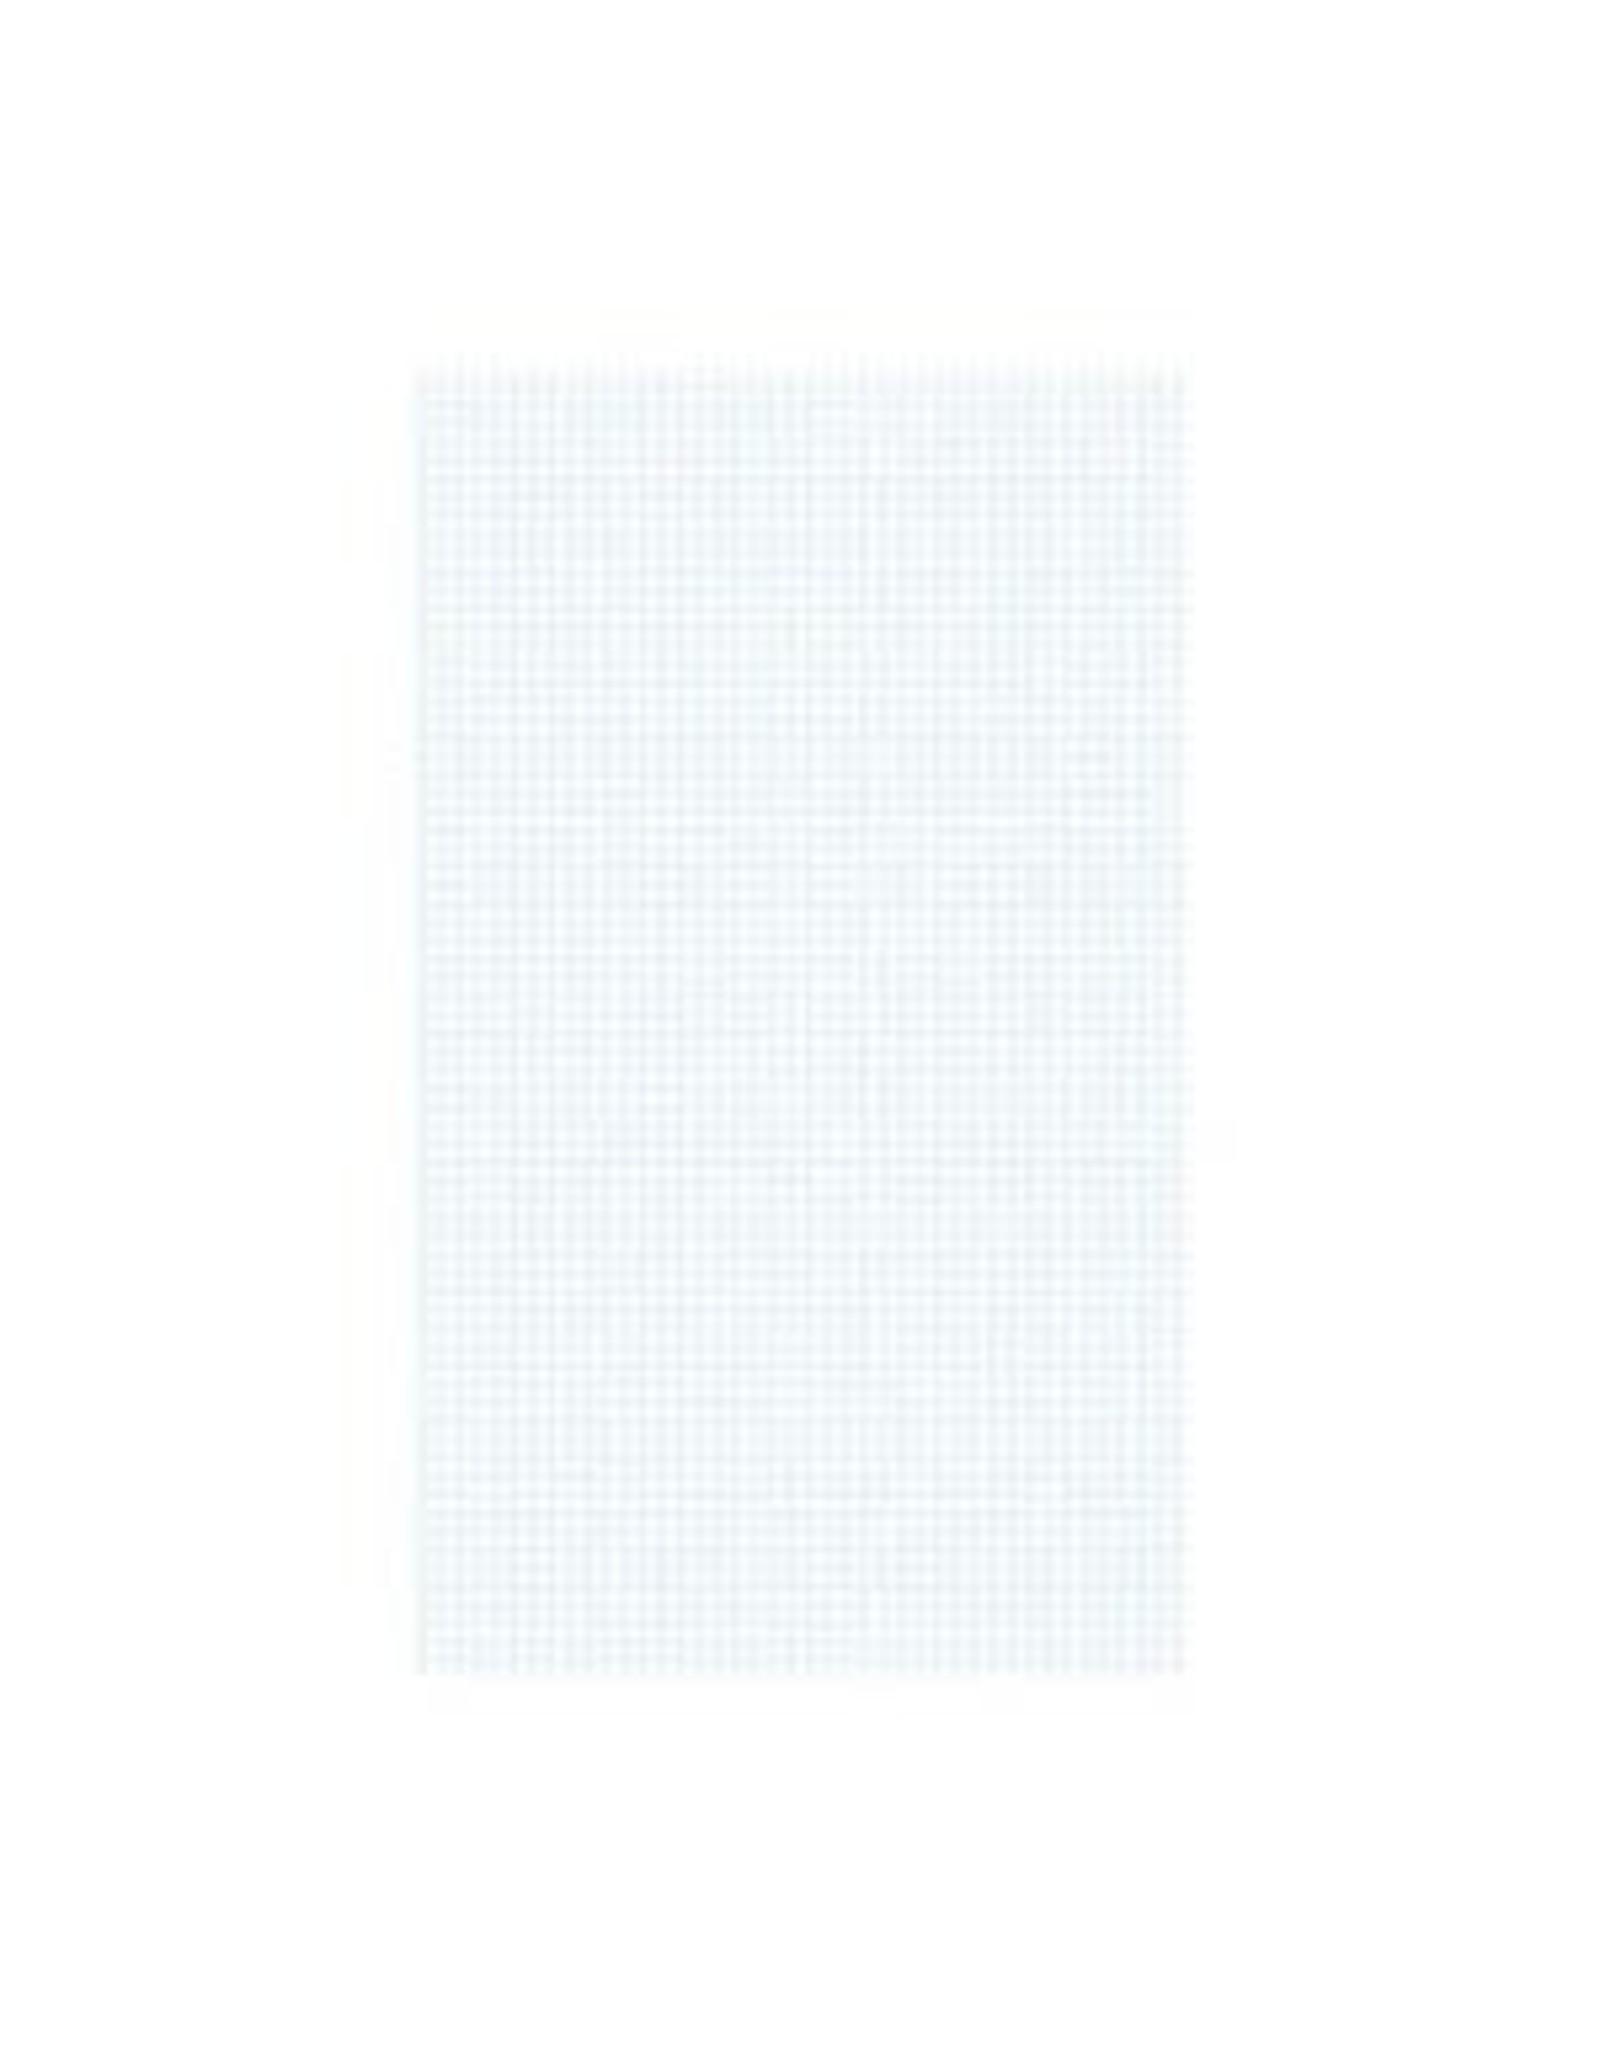 KLEID Memo & pen RF's Refill 2mm grid